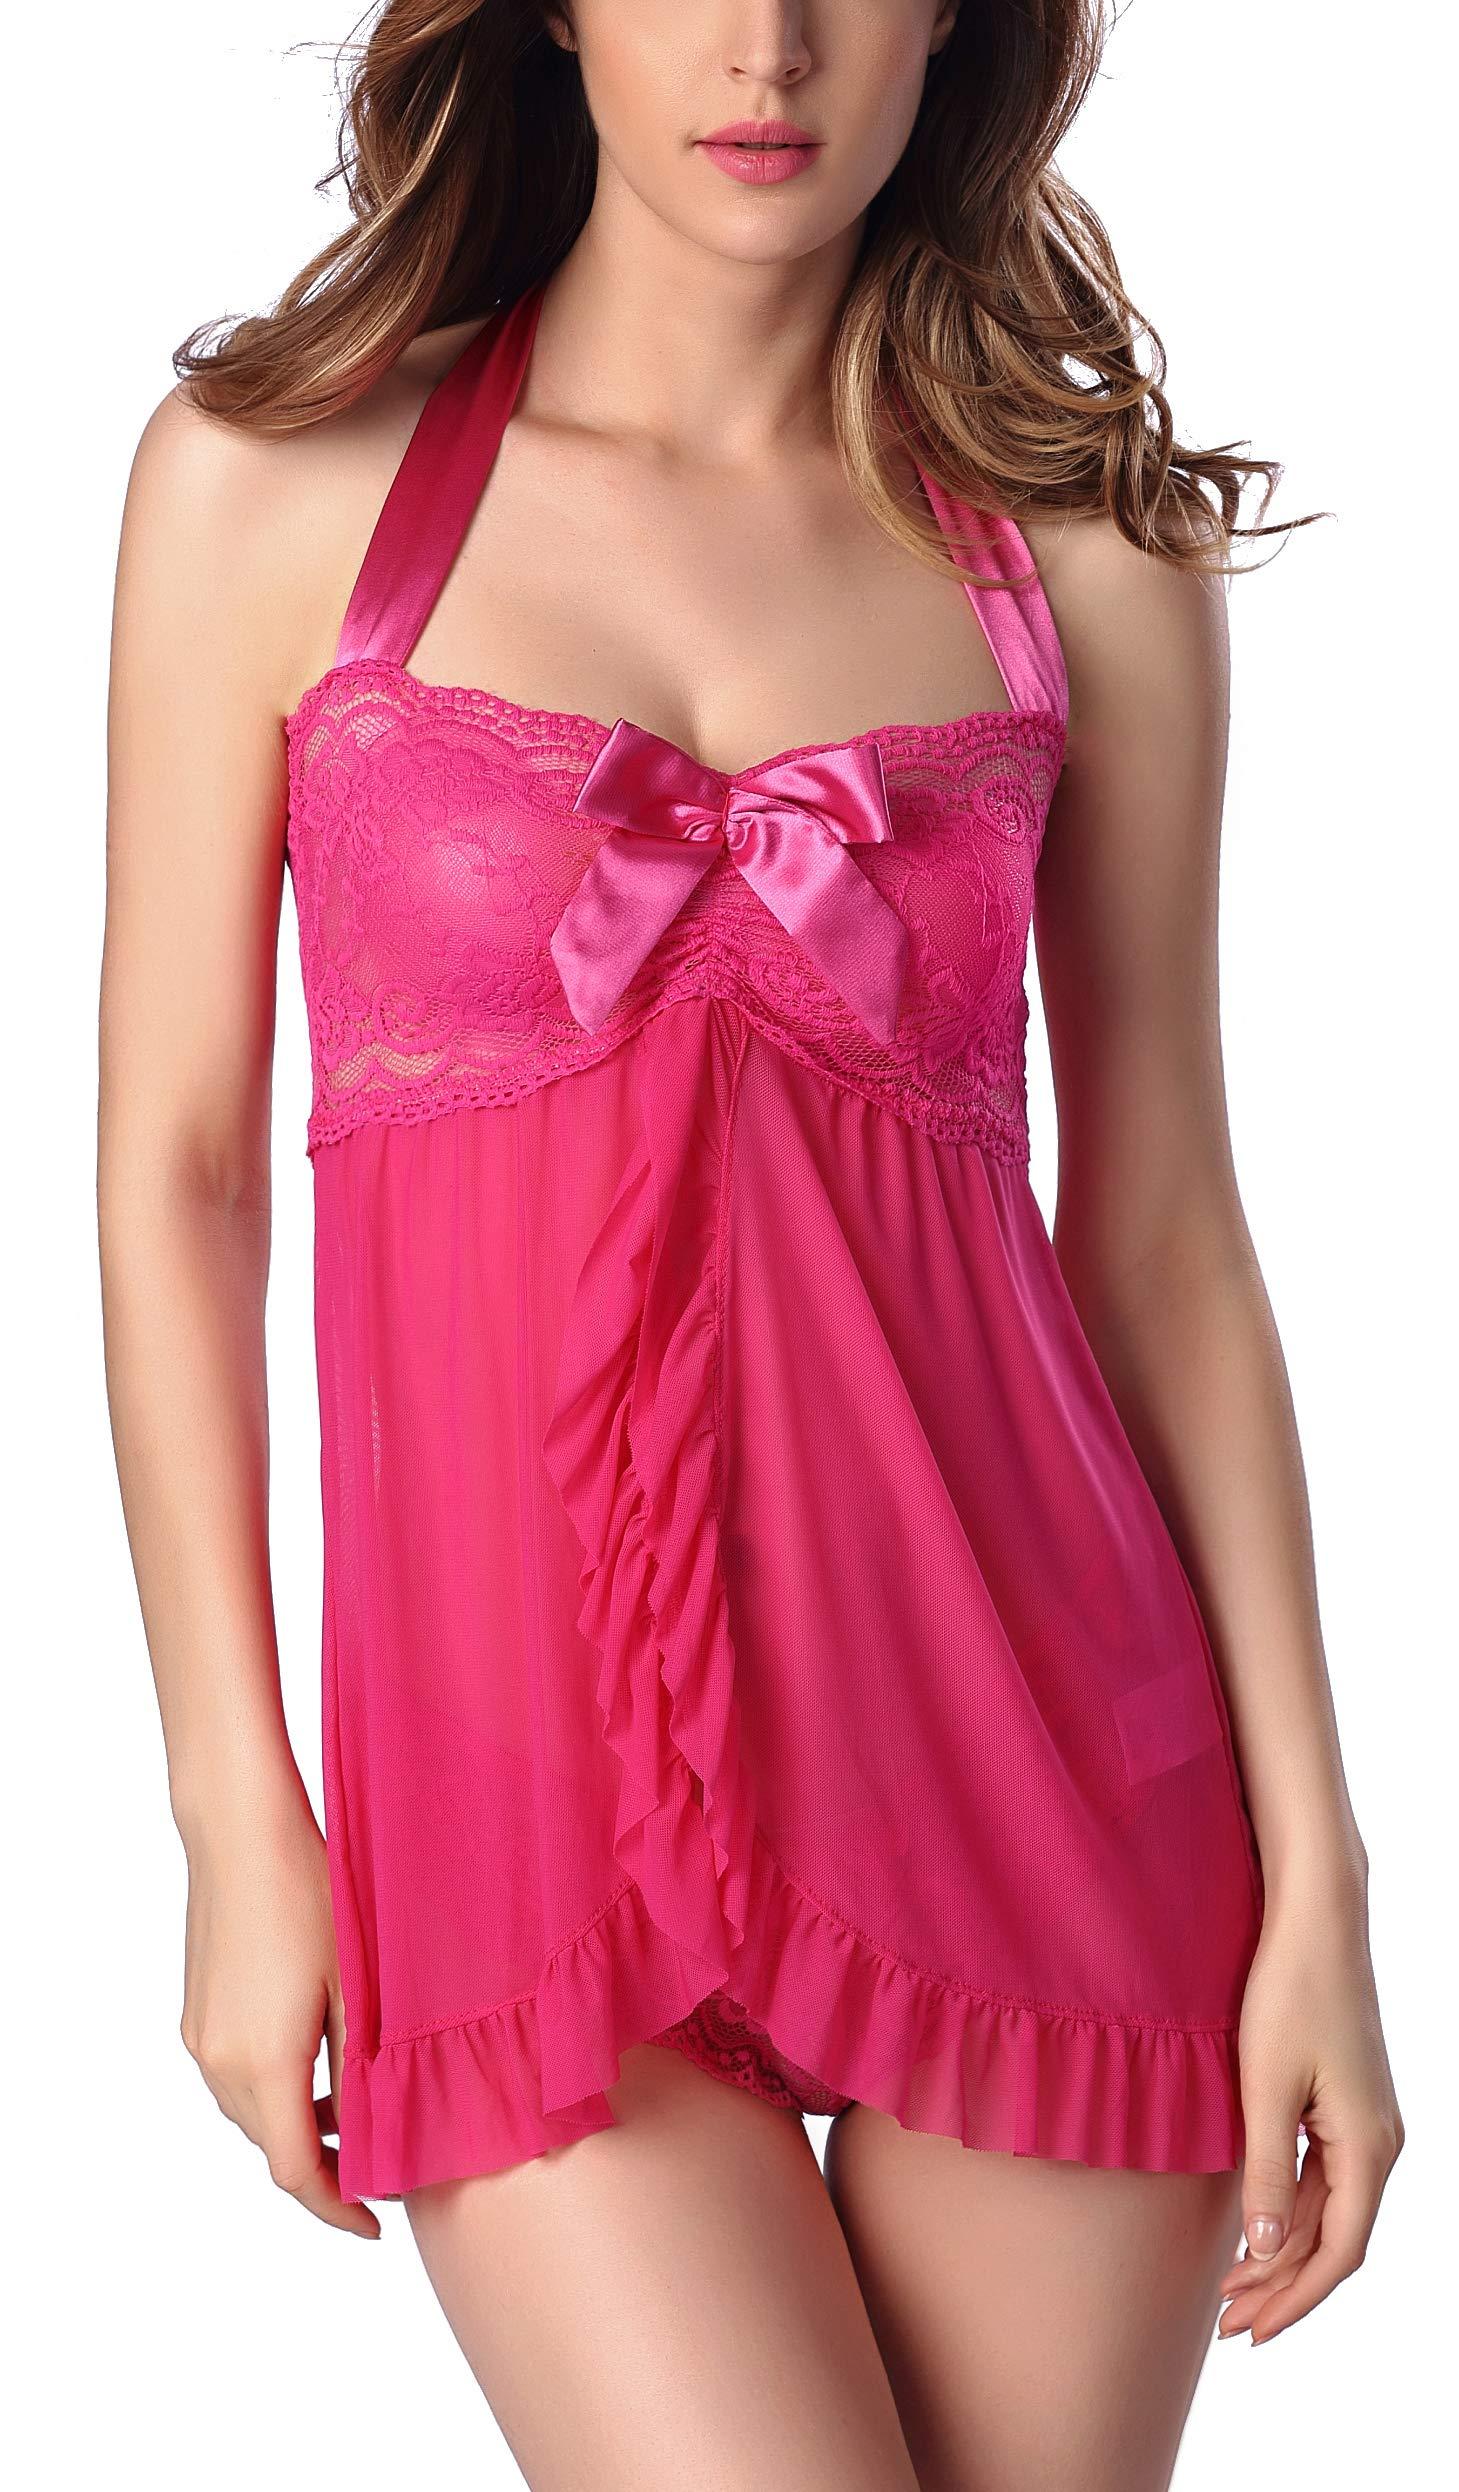 SHEKINI Women Lace Babydoll Halter Dress V-Neck Lingerie Sexy One Piece Bodysuit Sleepwear Nightgown Chemise